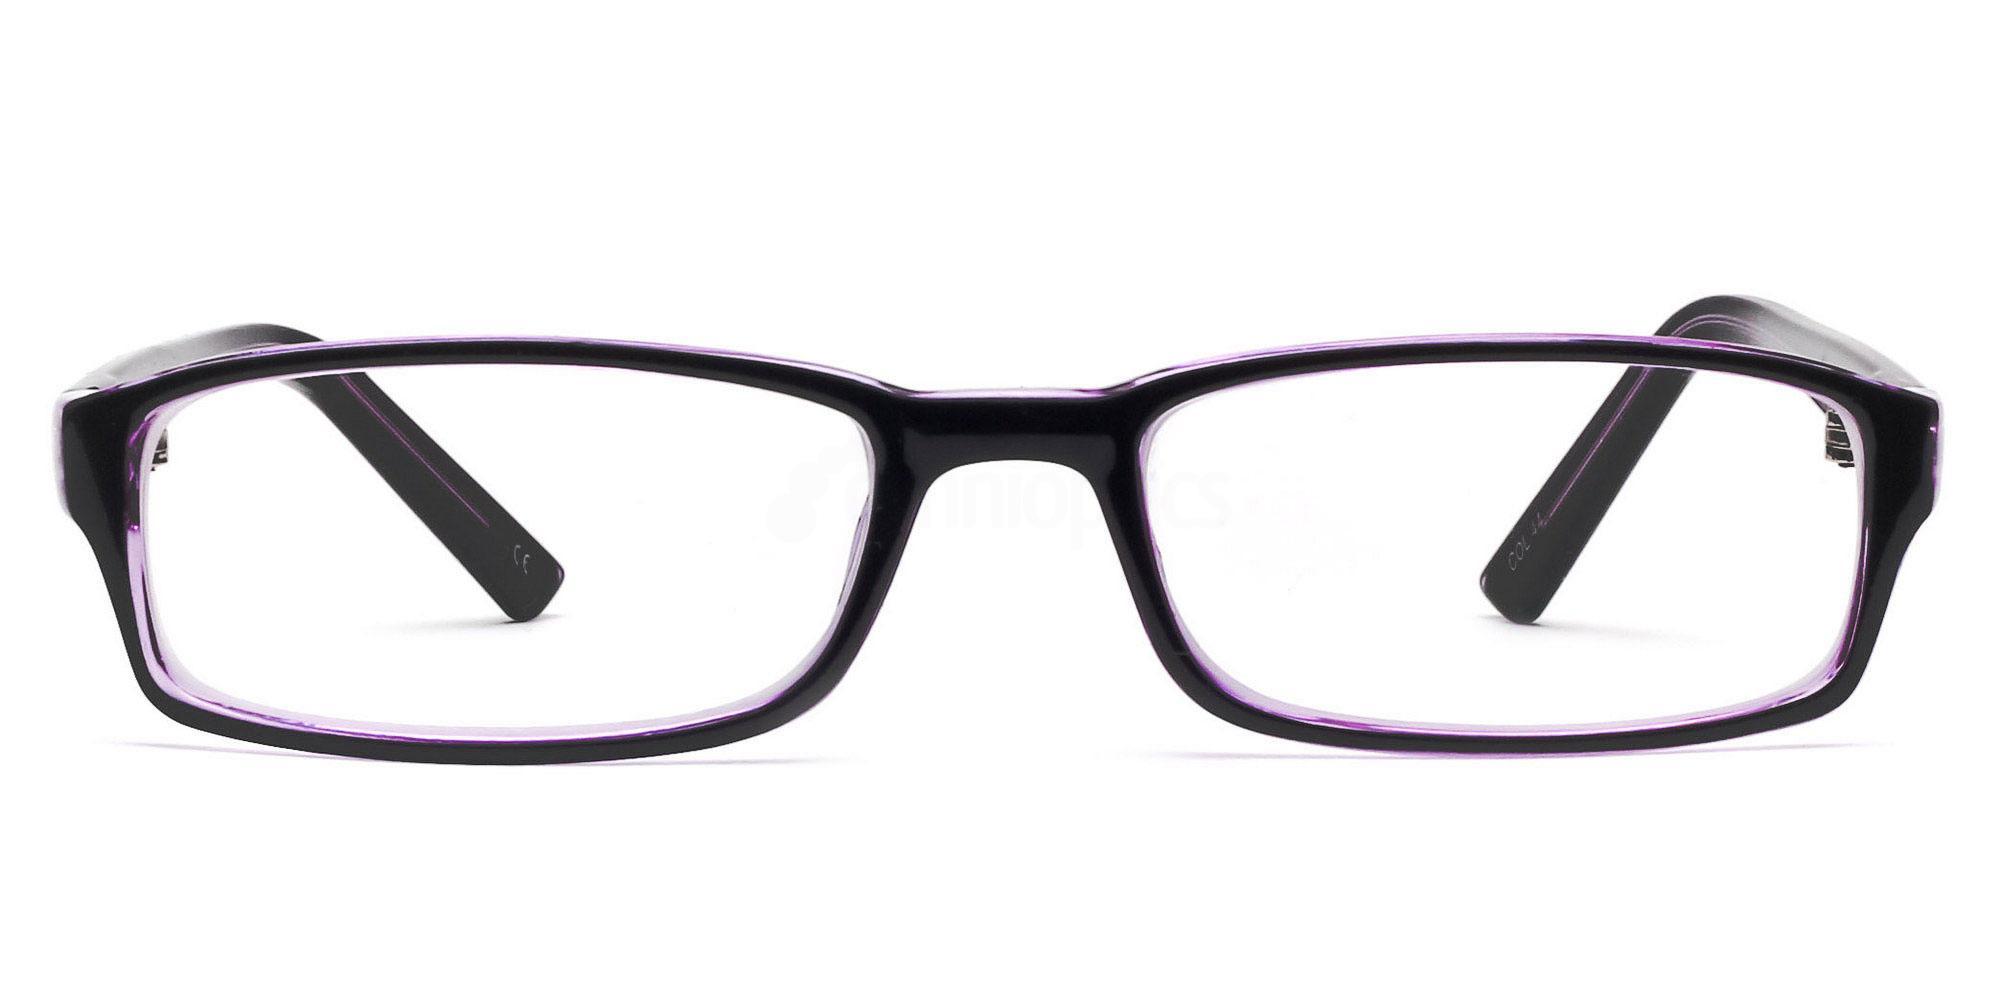 COL.44 2264 - Purple and Black , Savannah